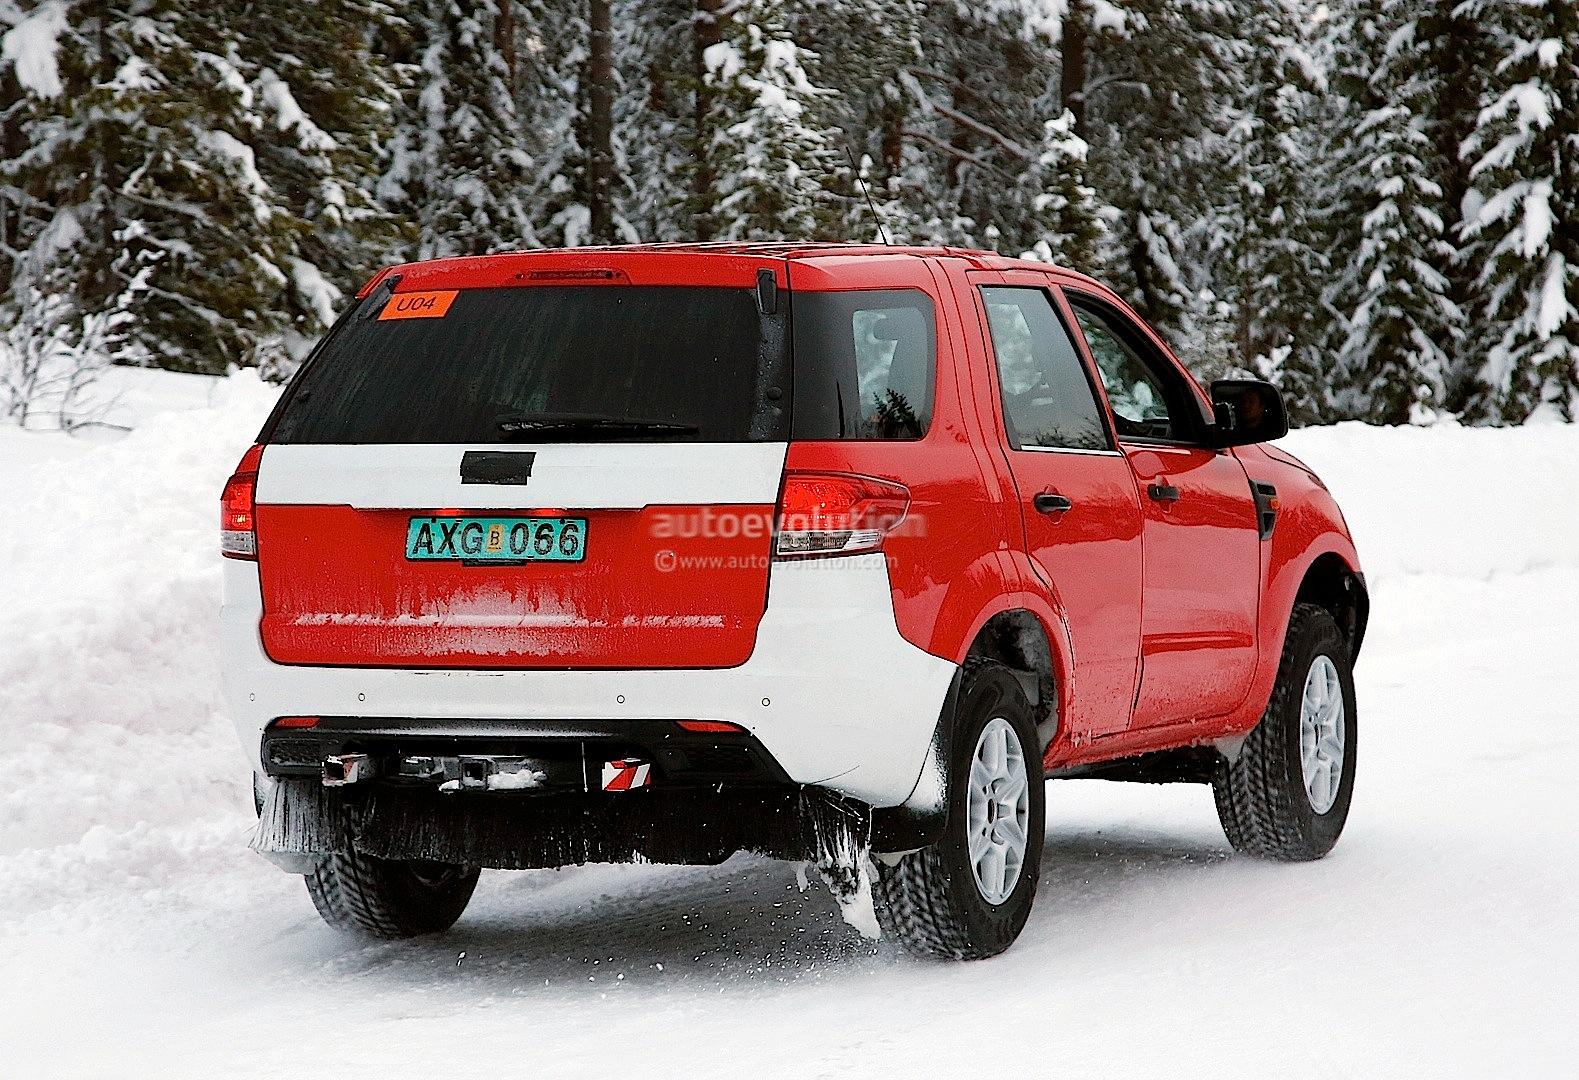 Spyshots: New Ford Ranger-based SUV Mule Caught Testing